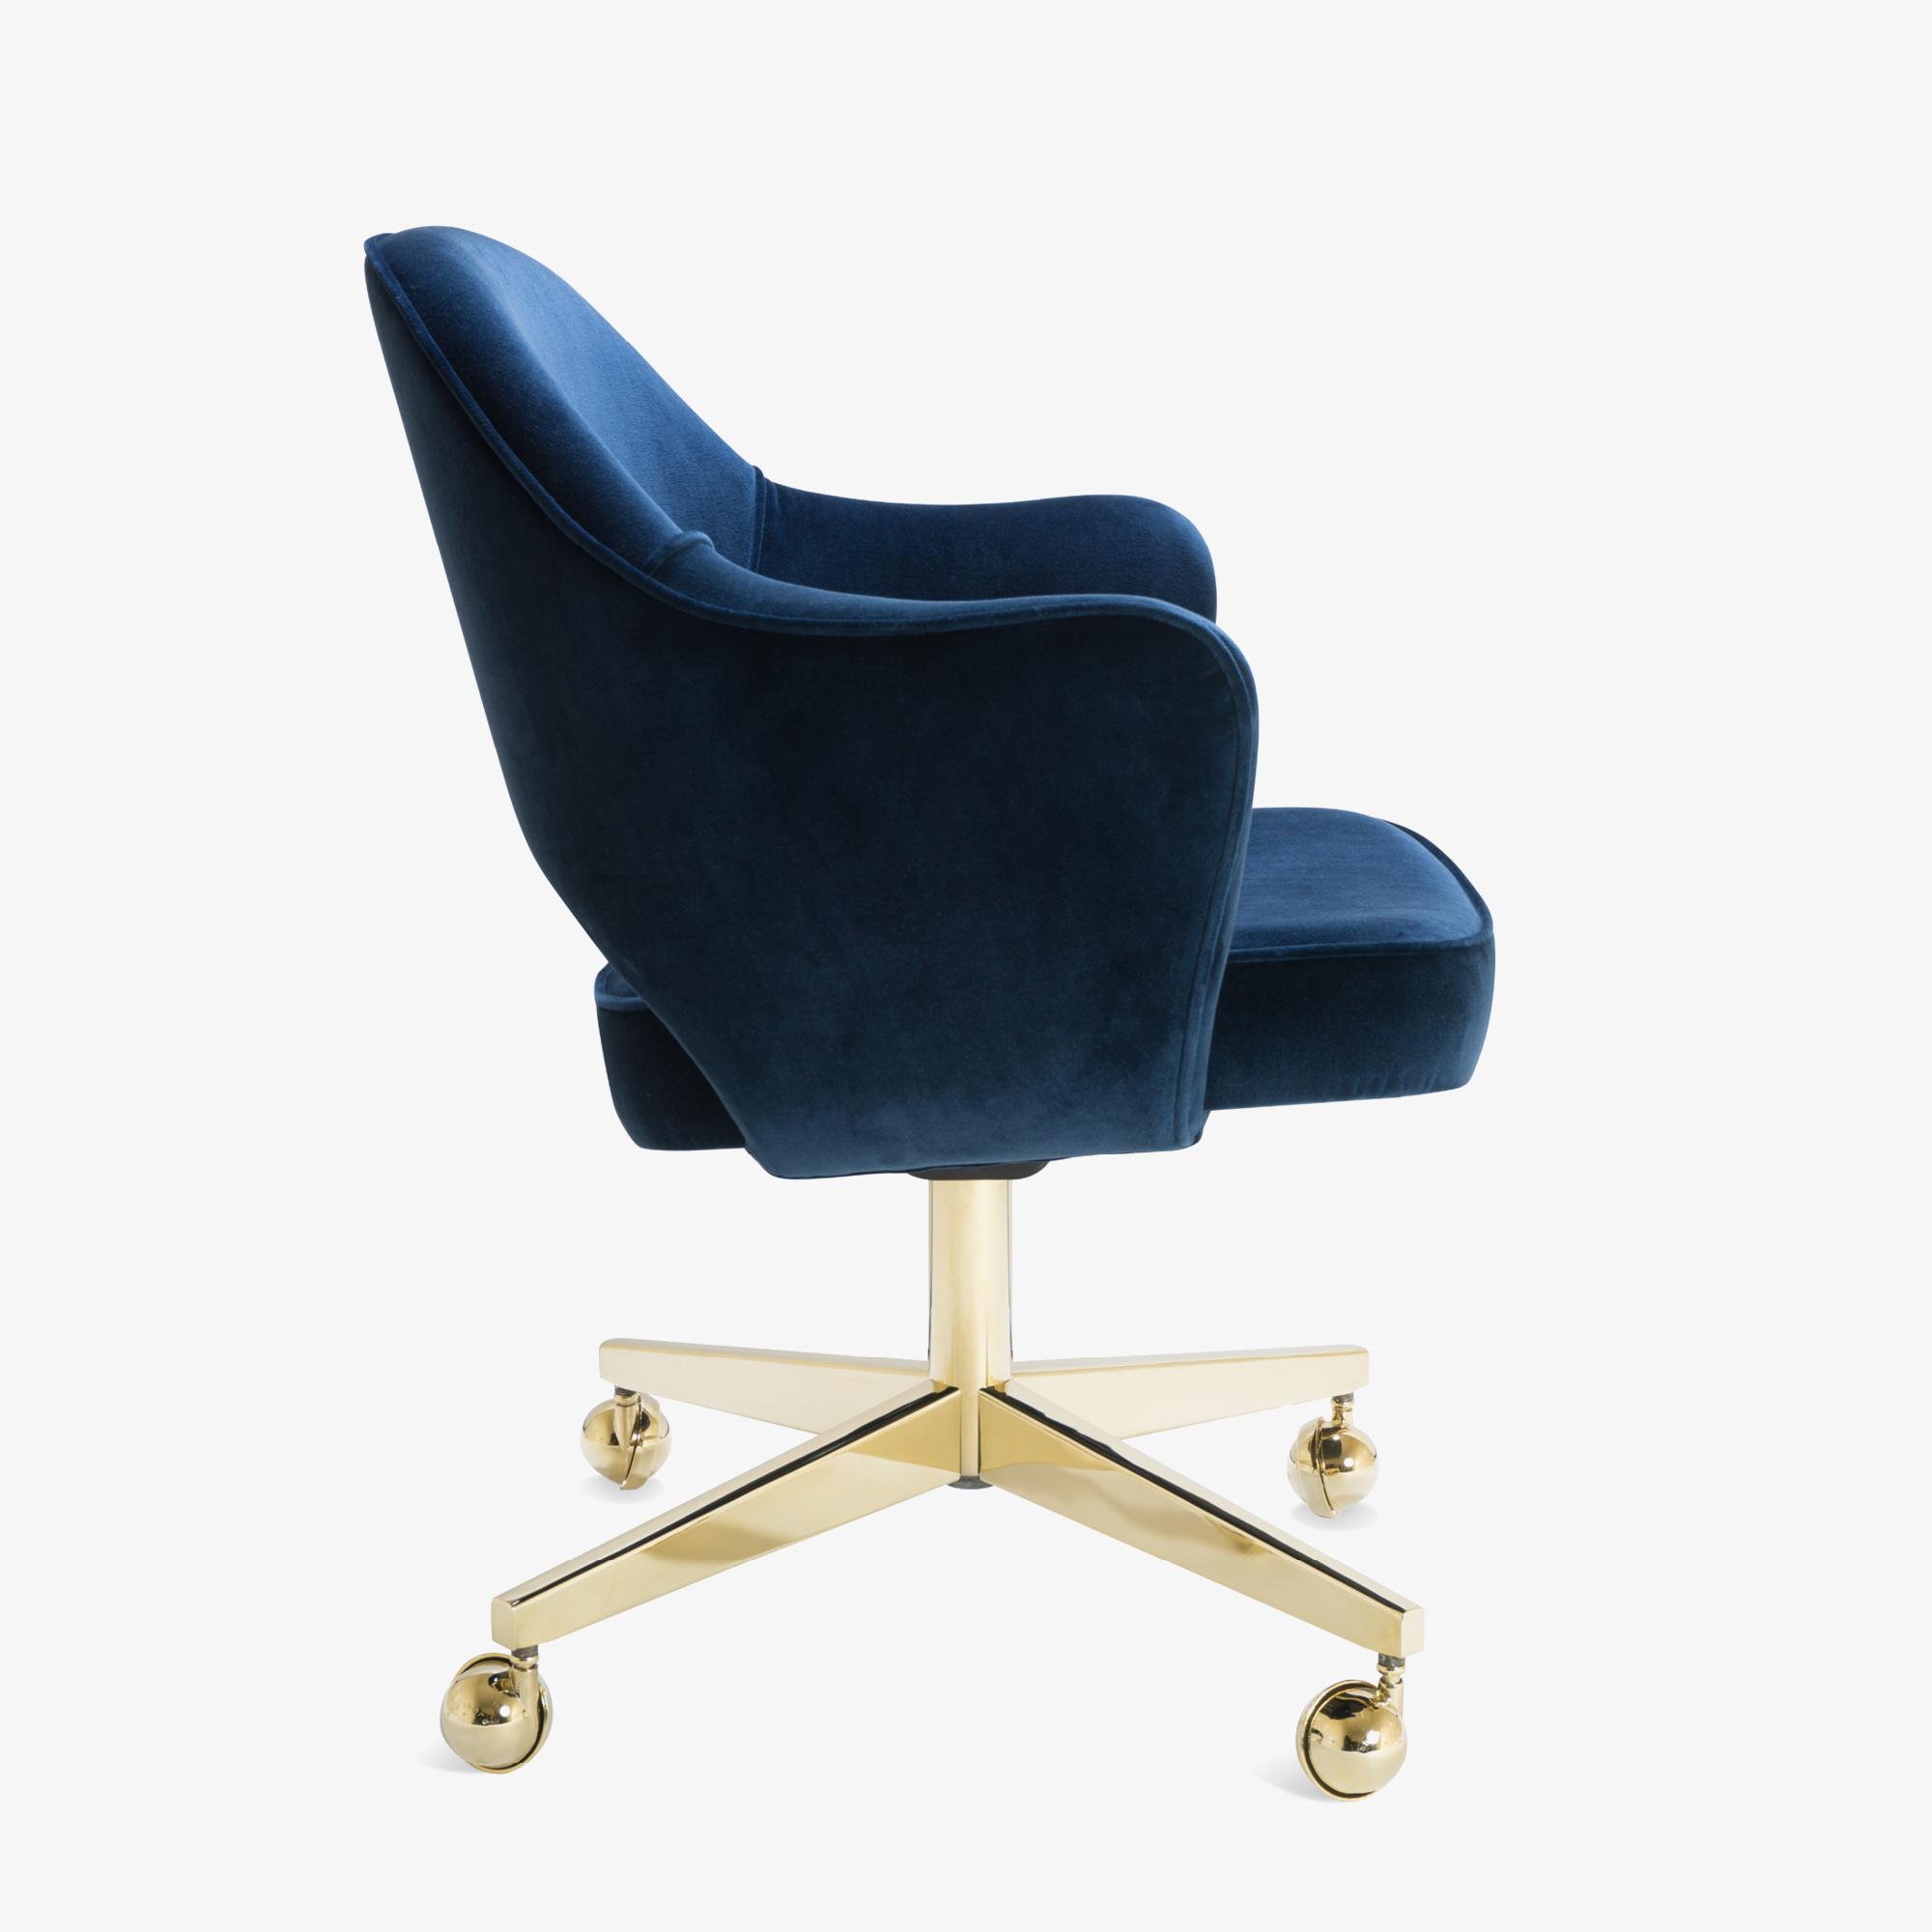 Saarinen Executive Arm Chair in Navy Velvet, Swivel Base, 24k Gold Edition4.png